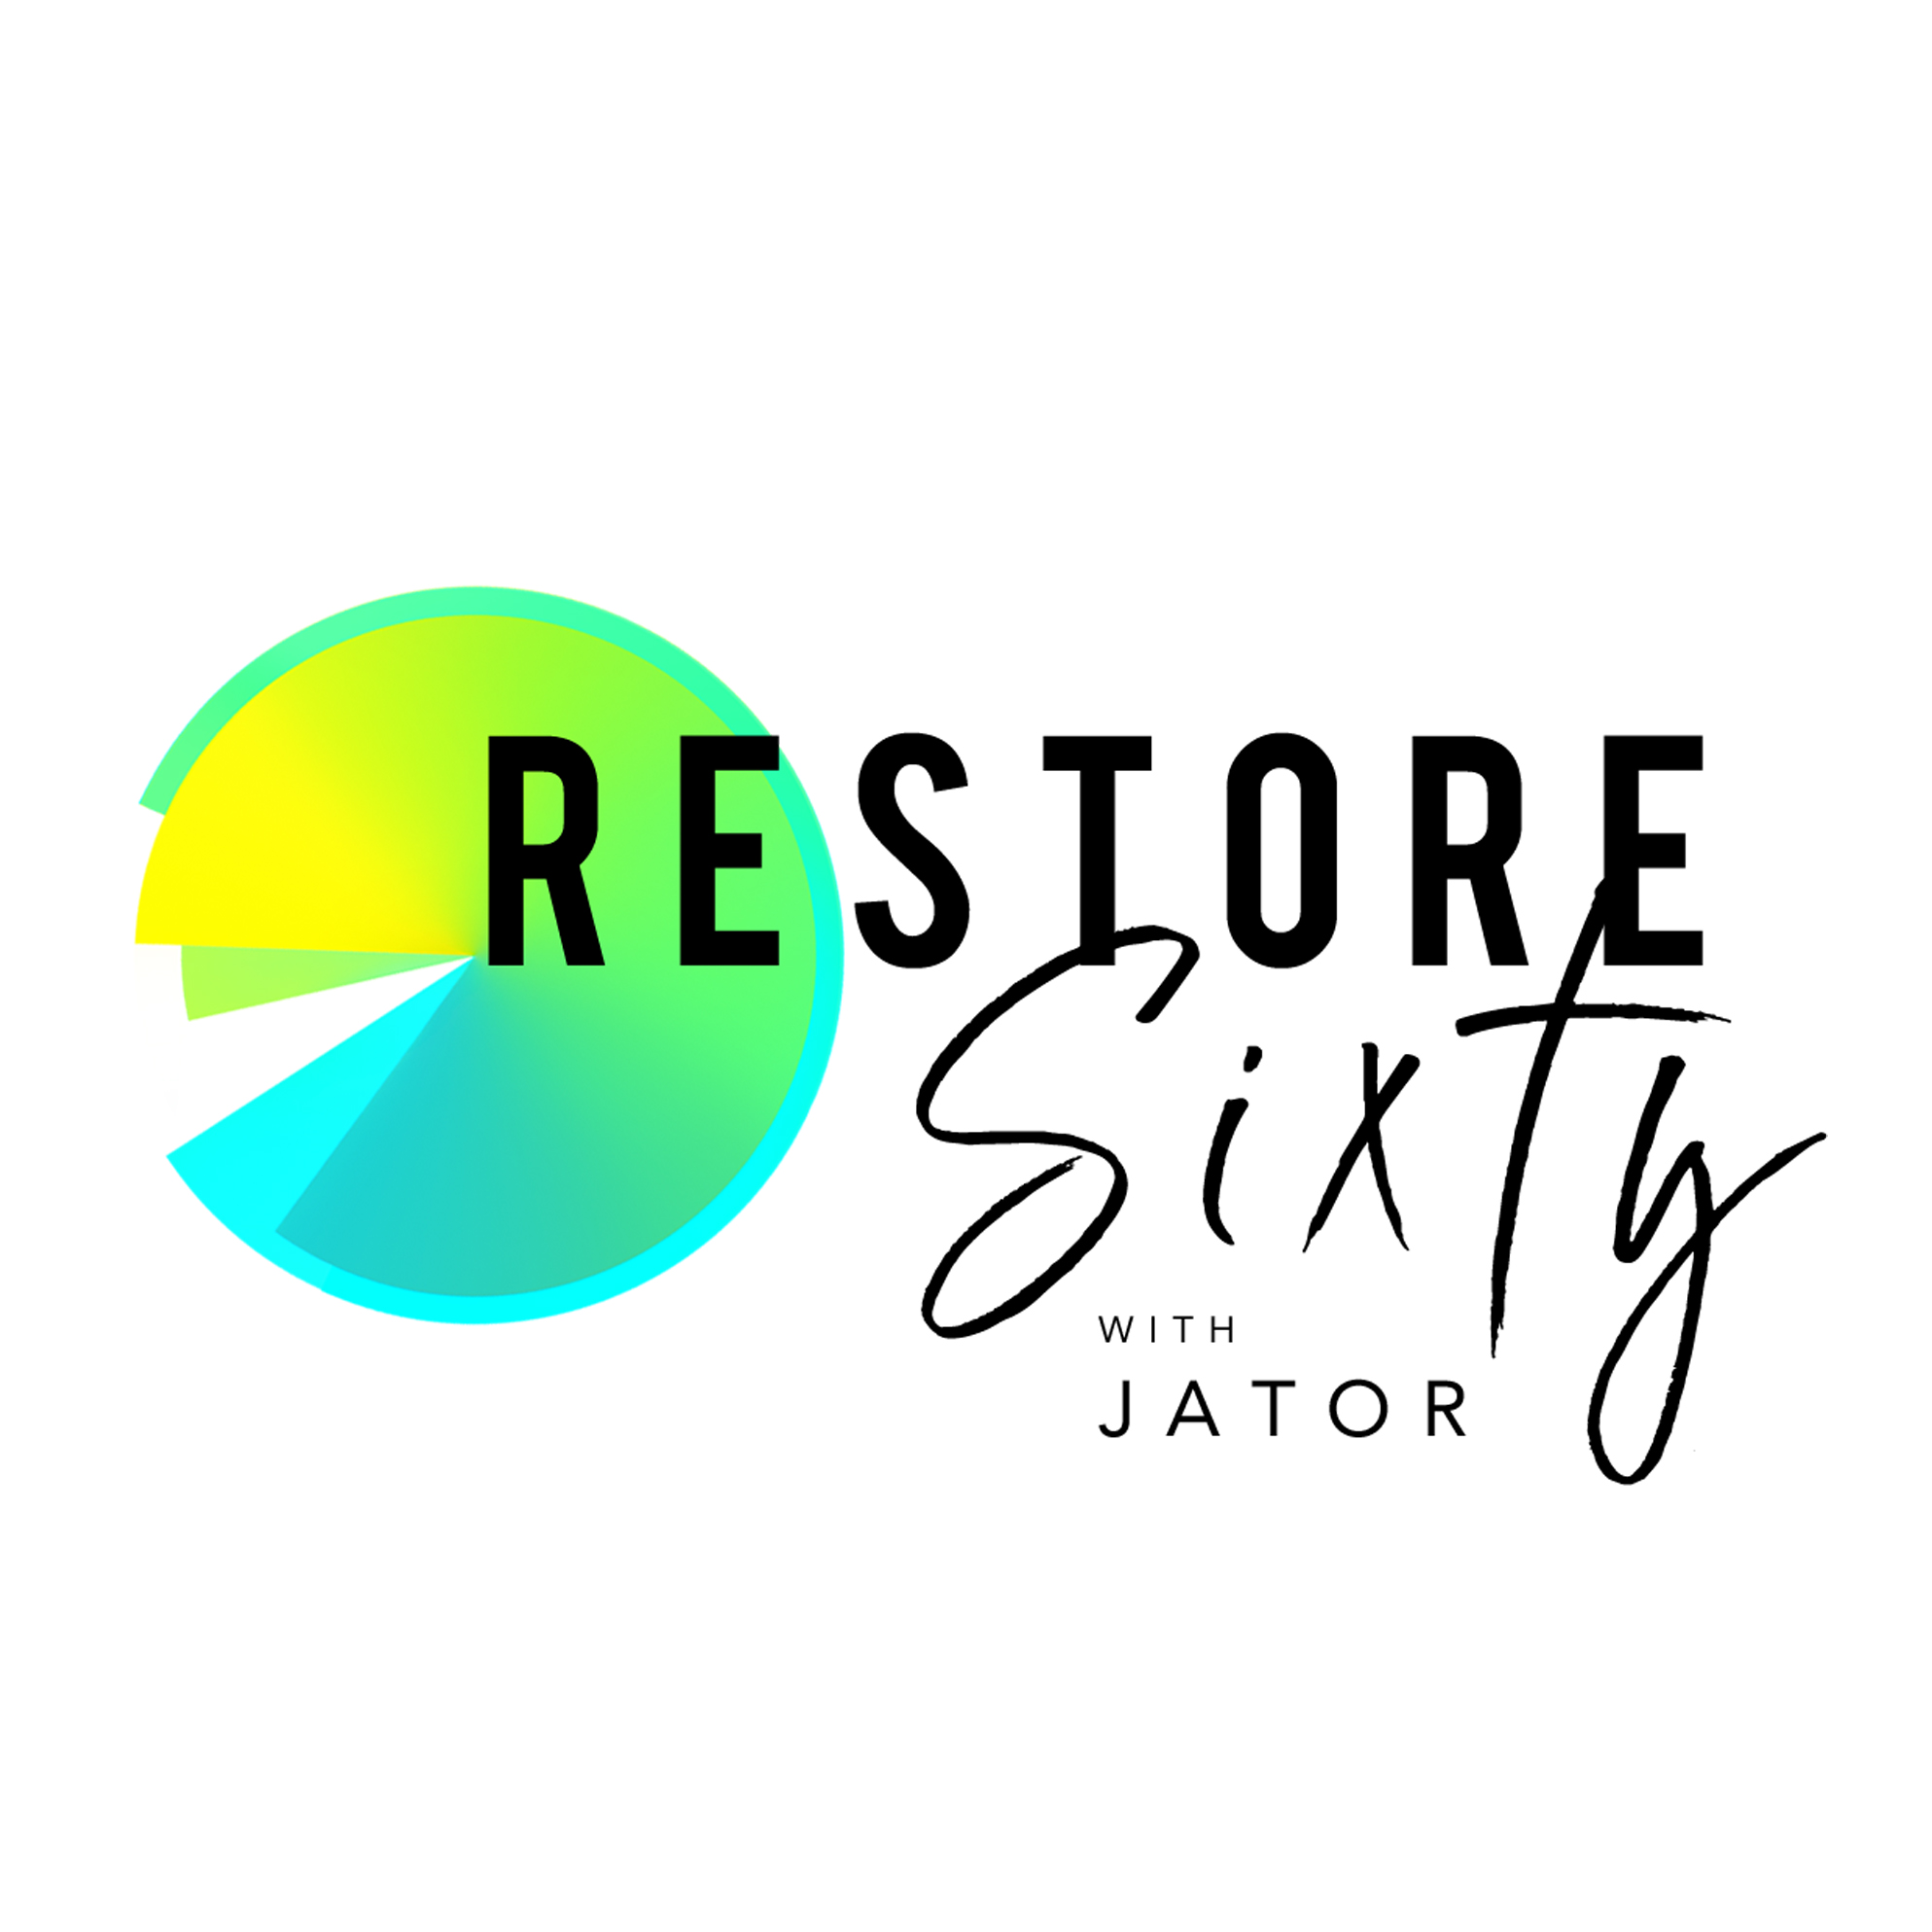 Restore60wJATOR-FINAL-sq copy.jpg